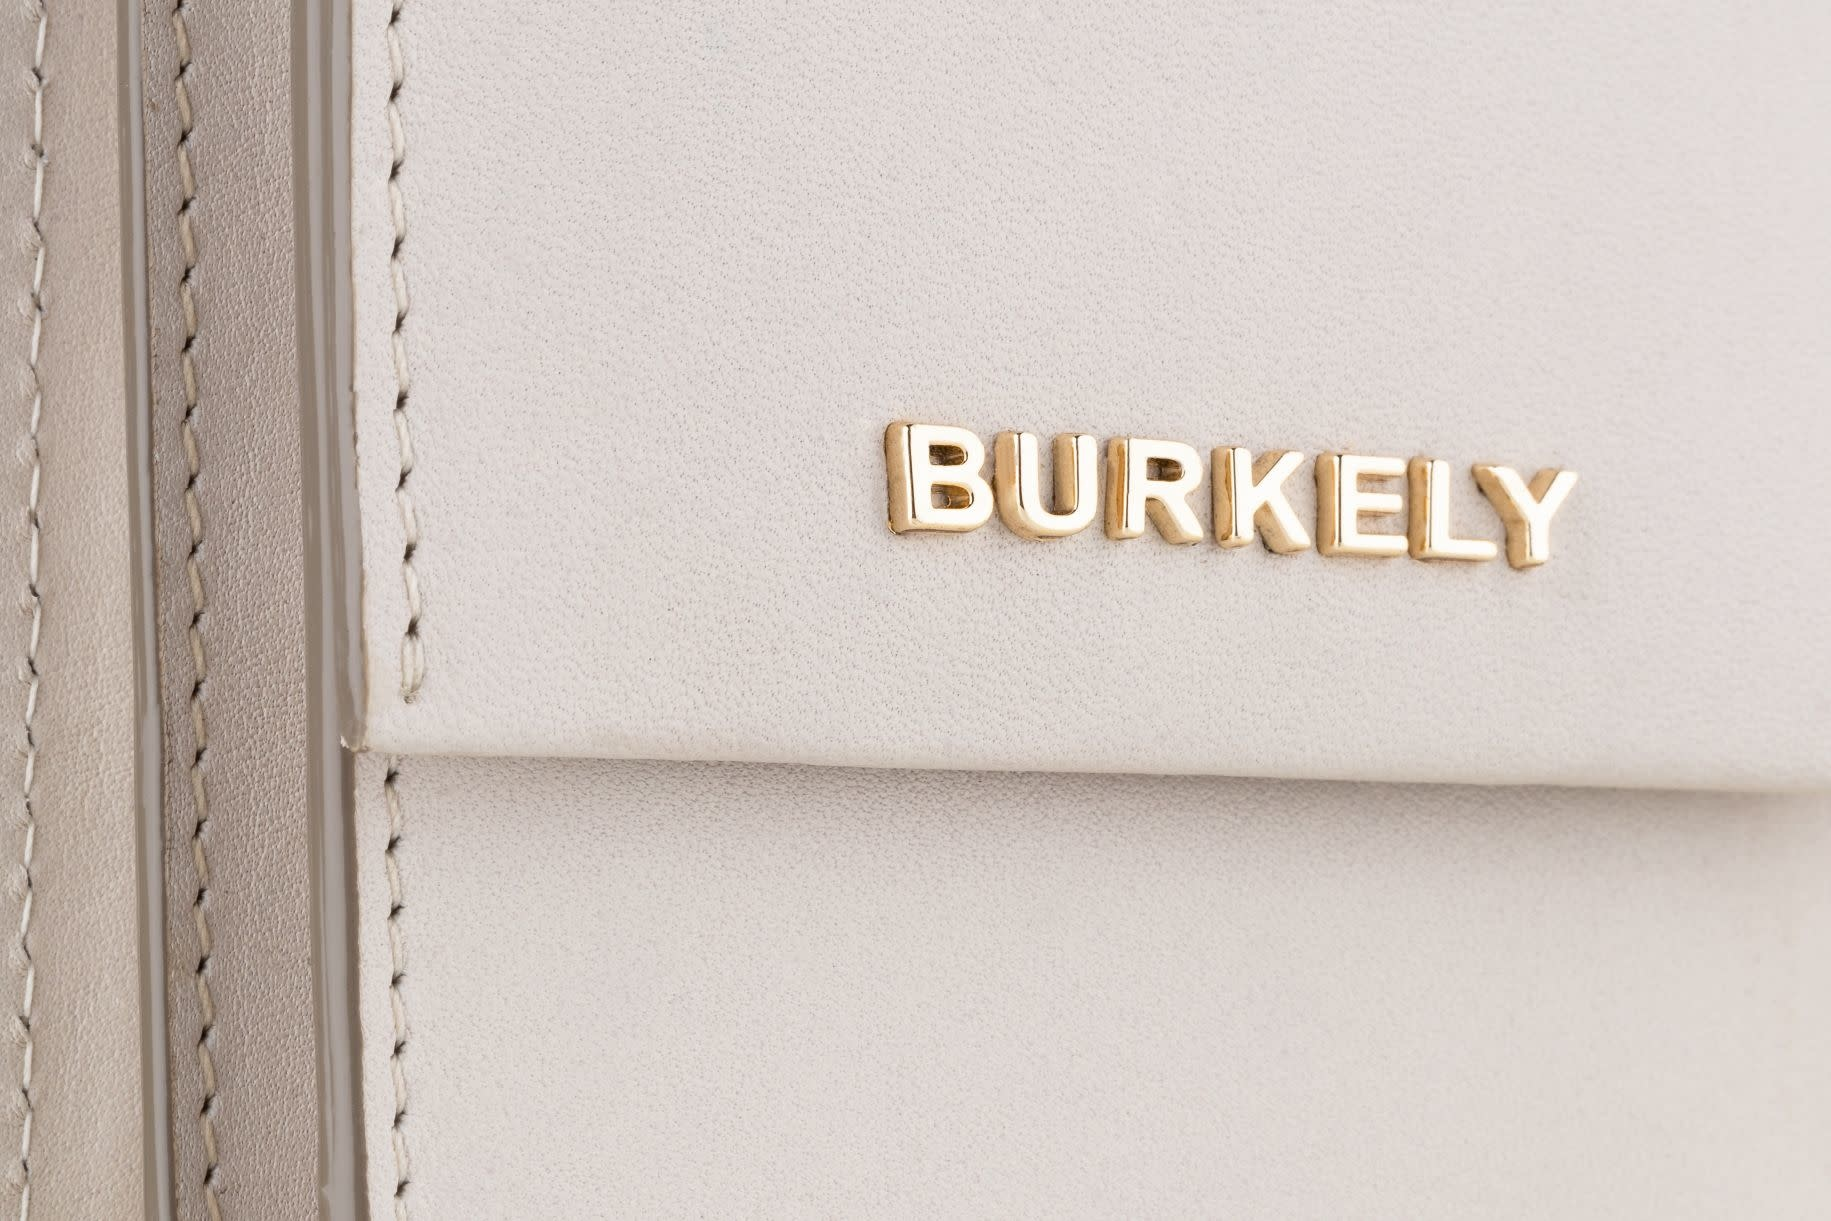 Burkely Parisian Paige - Citybag - Ecru